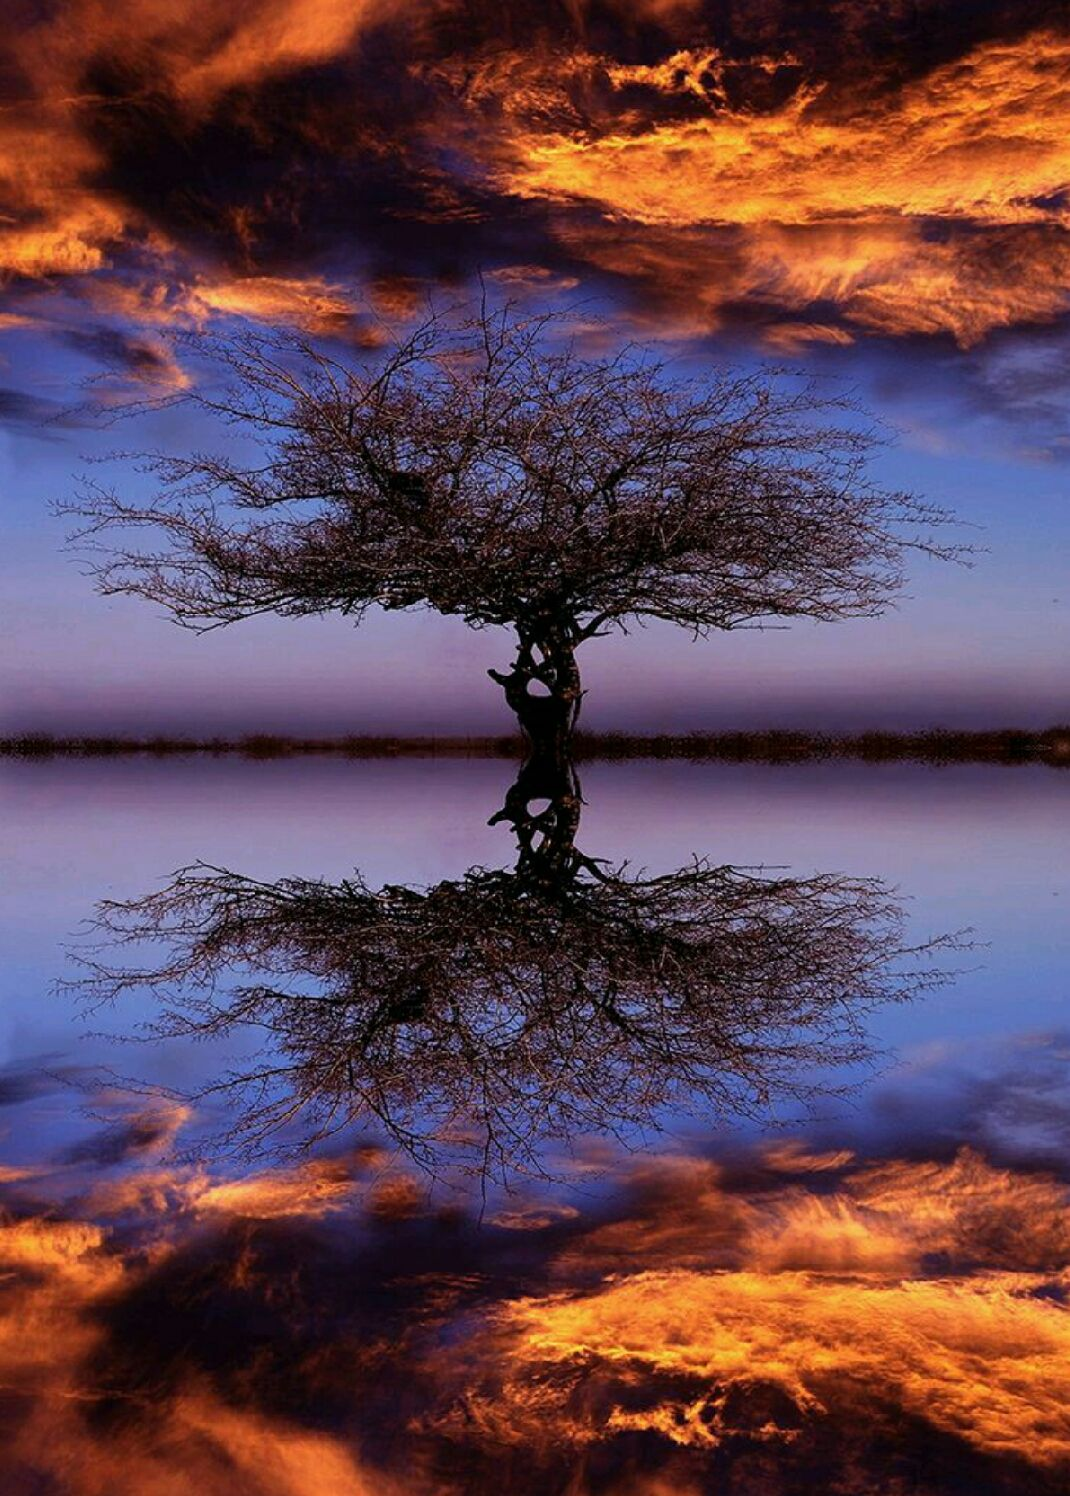 Effect Mirror Tree Reflection Nature Landscape Photography Cloud Fire Reflection Photography Beautiful Nature Photo